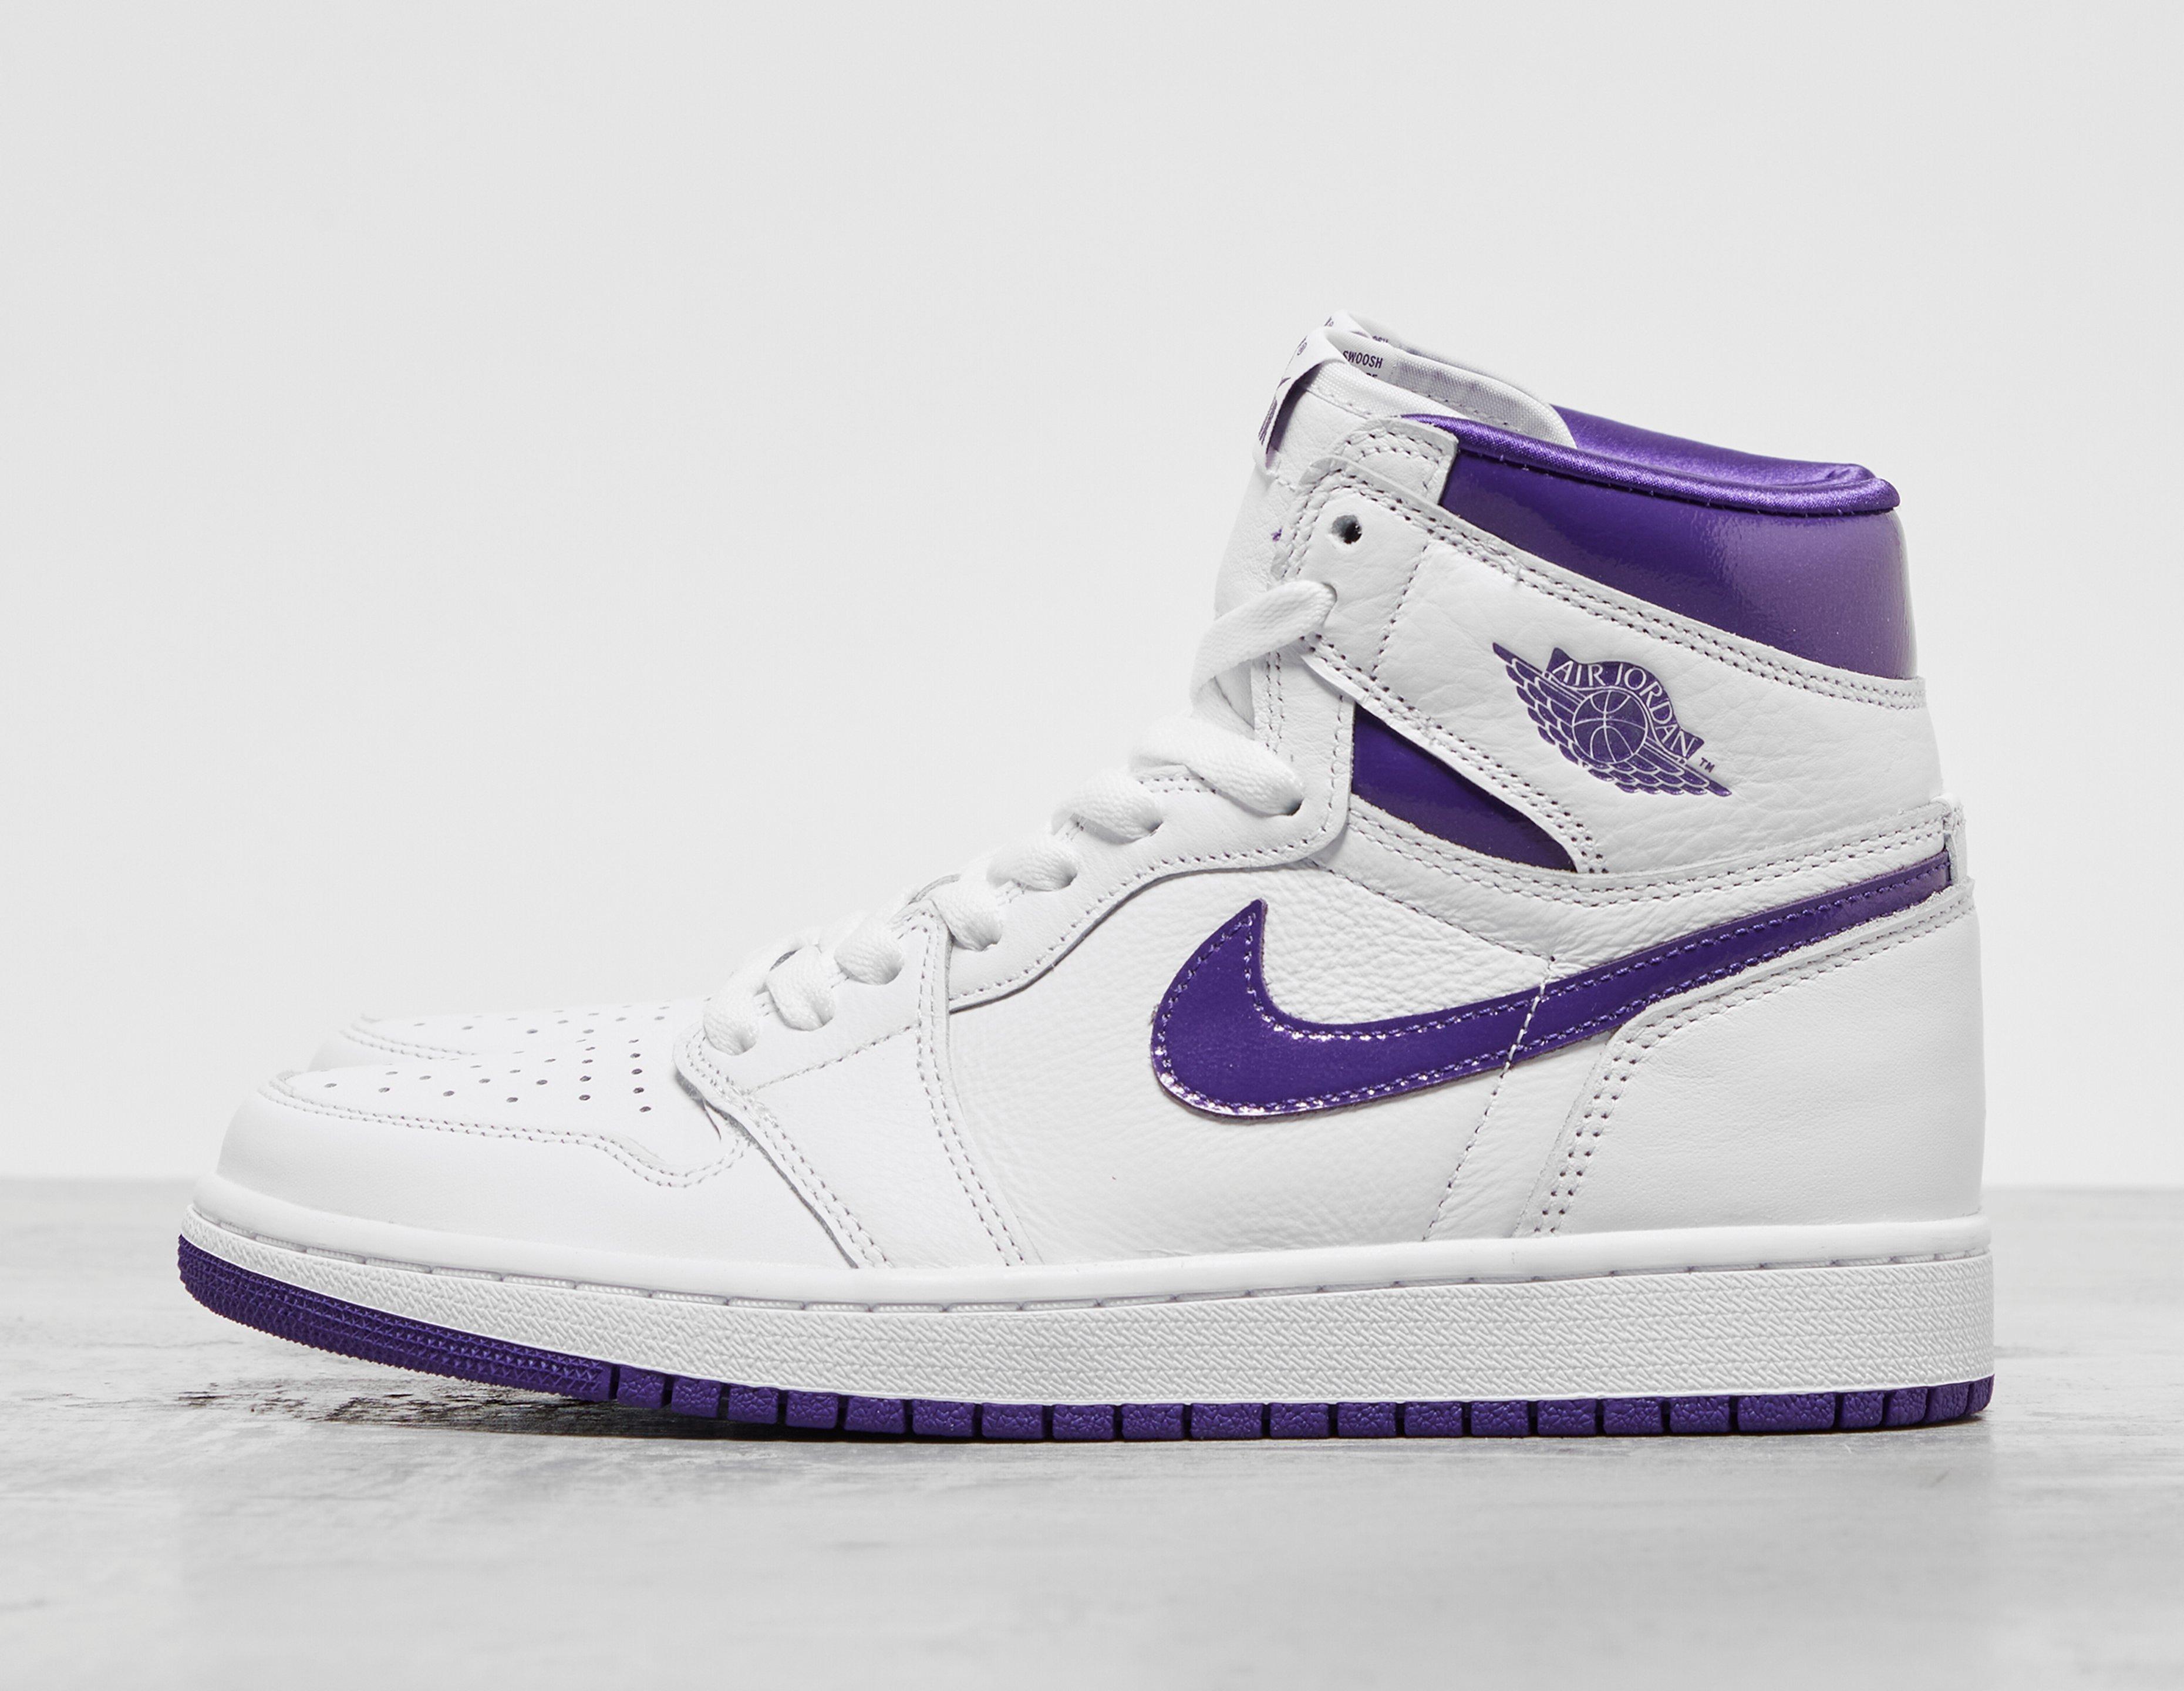 White Jordan Air Jordan 1 High 'Court Purple'   Ietp